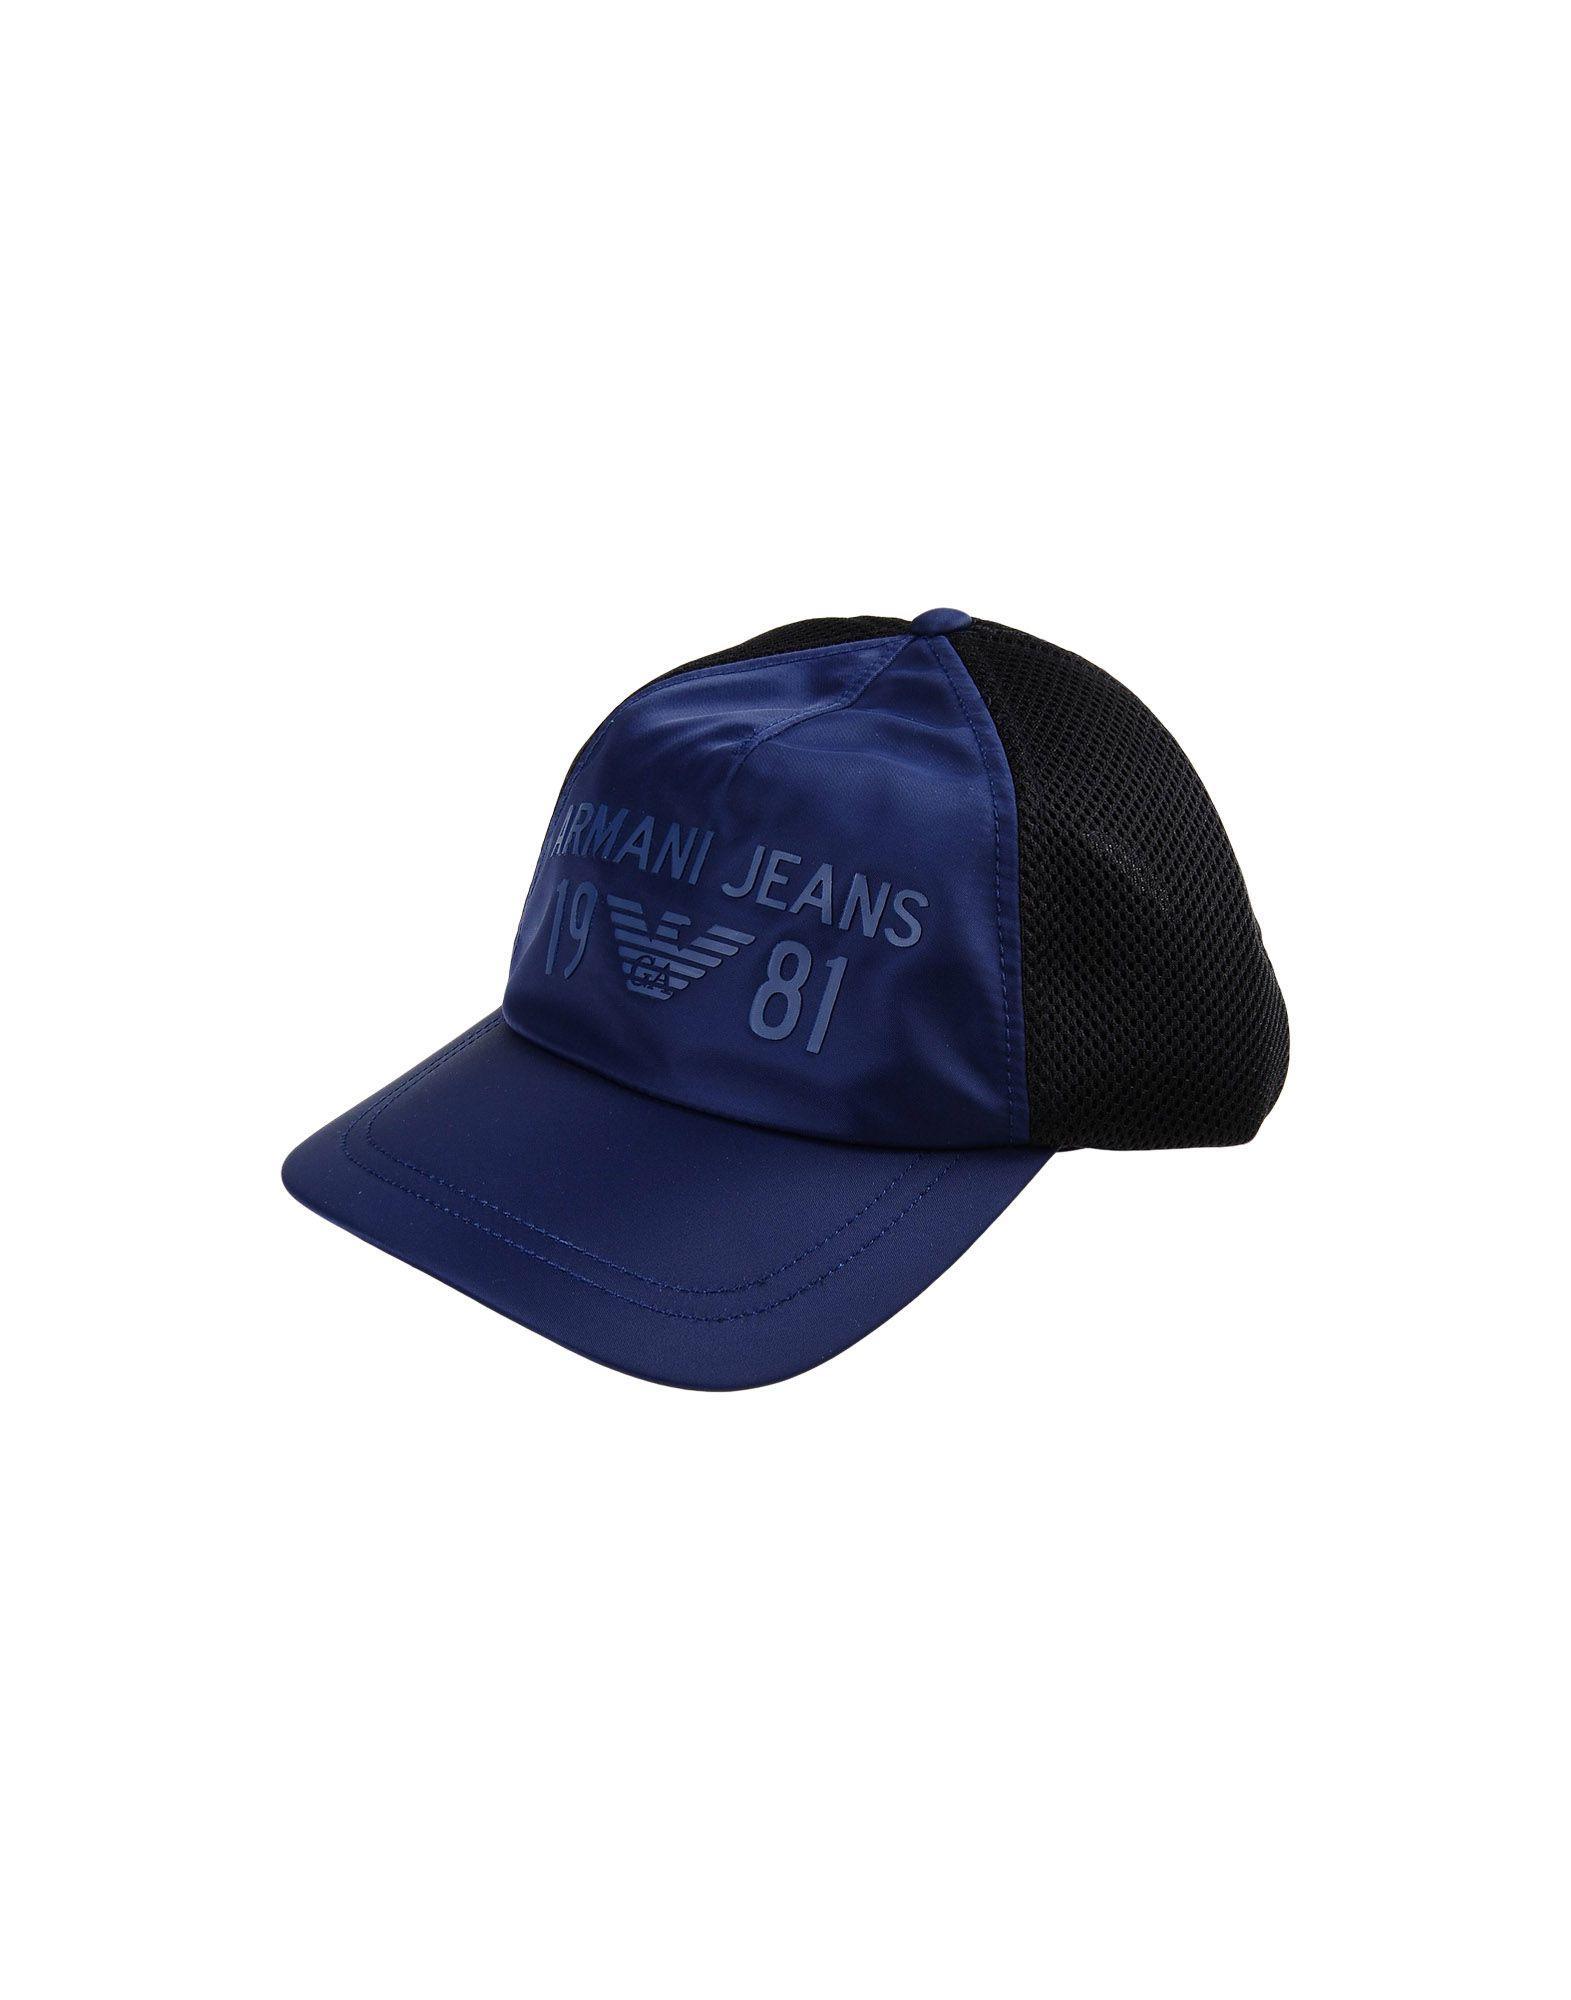 Armani Jeans Hats In Dark Blue